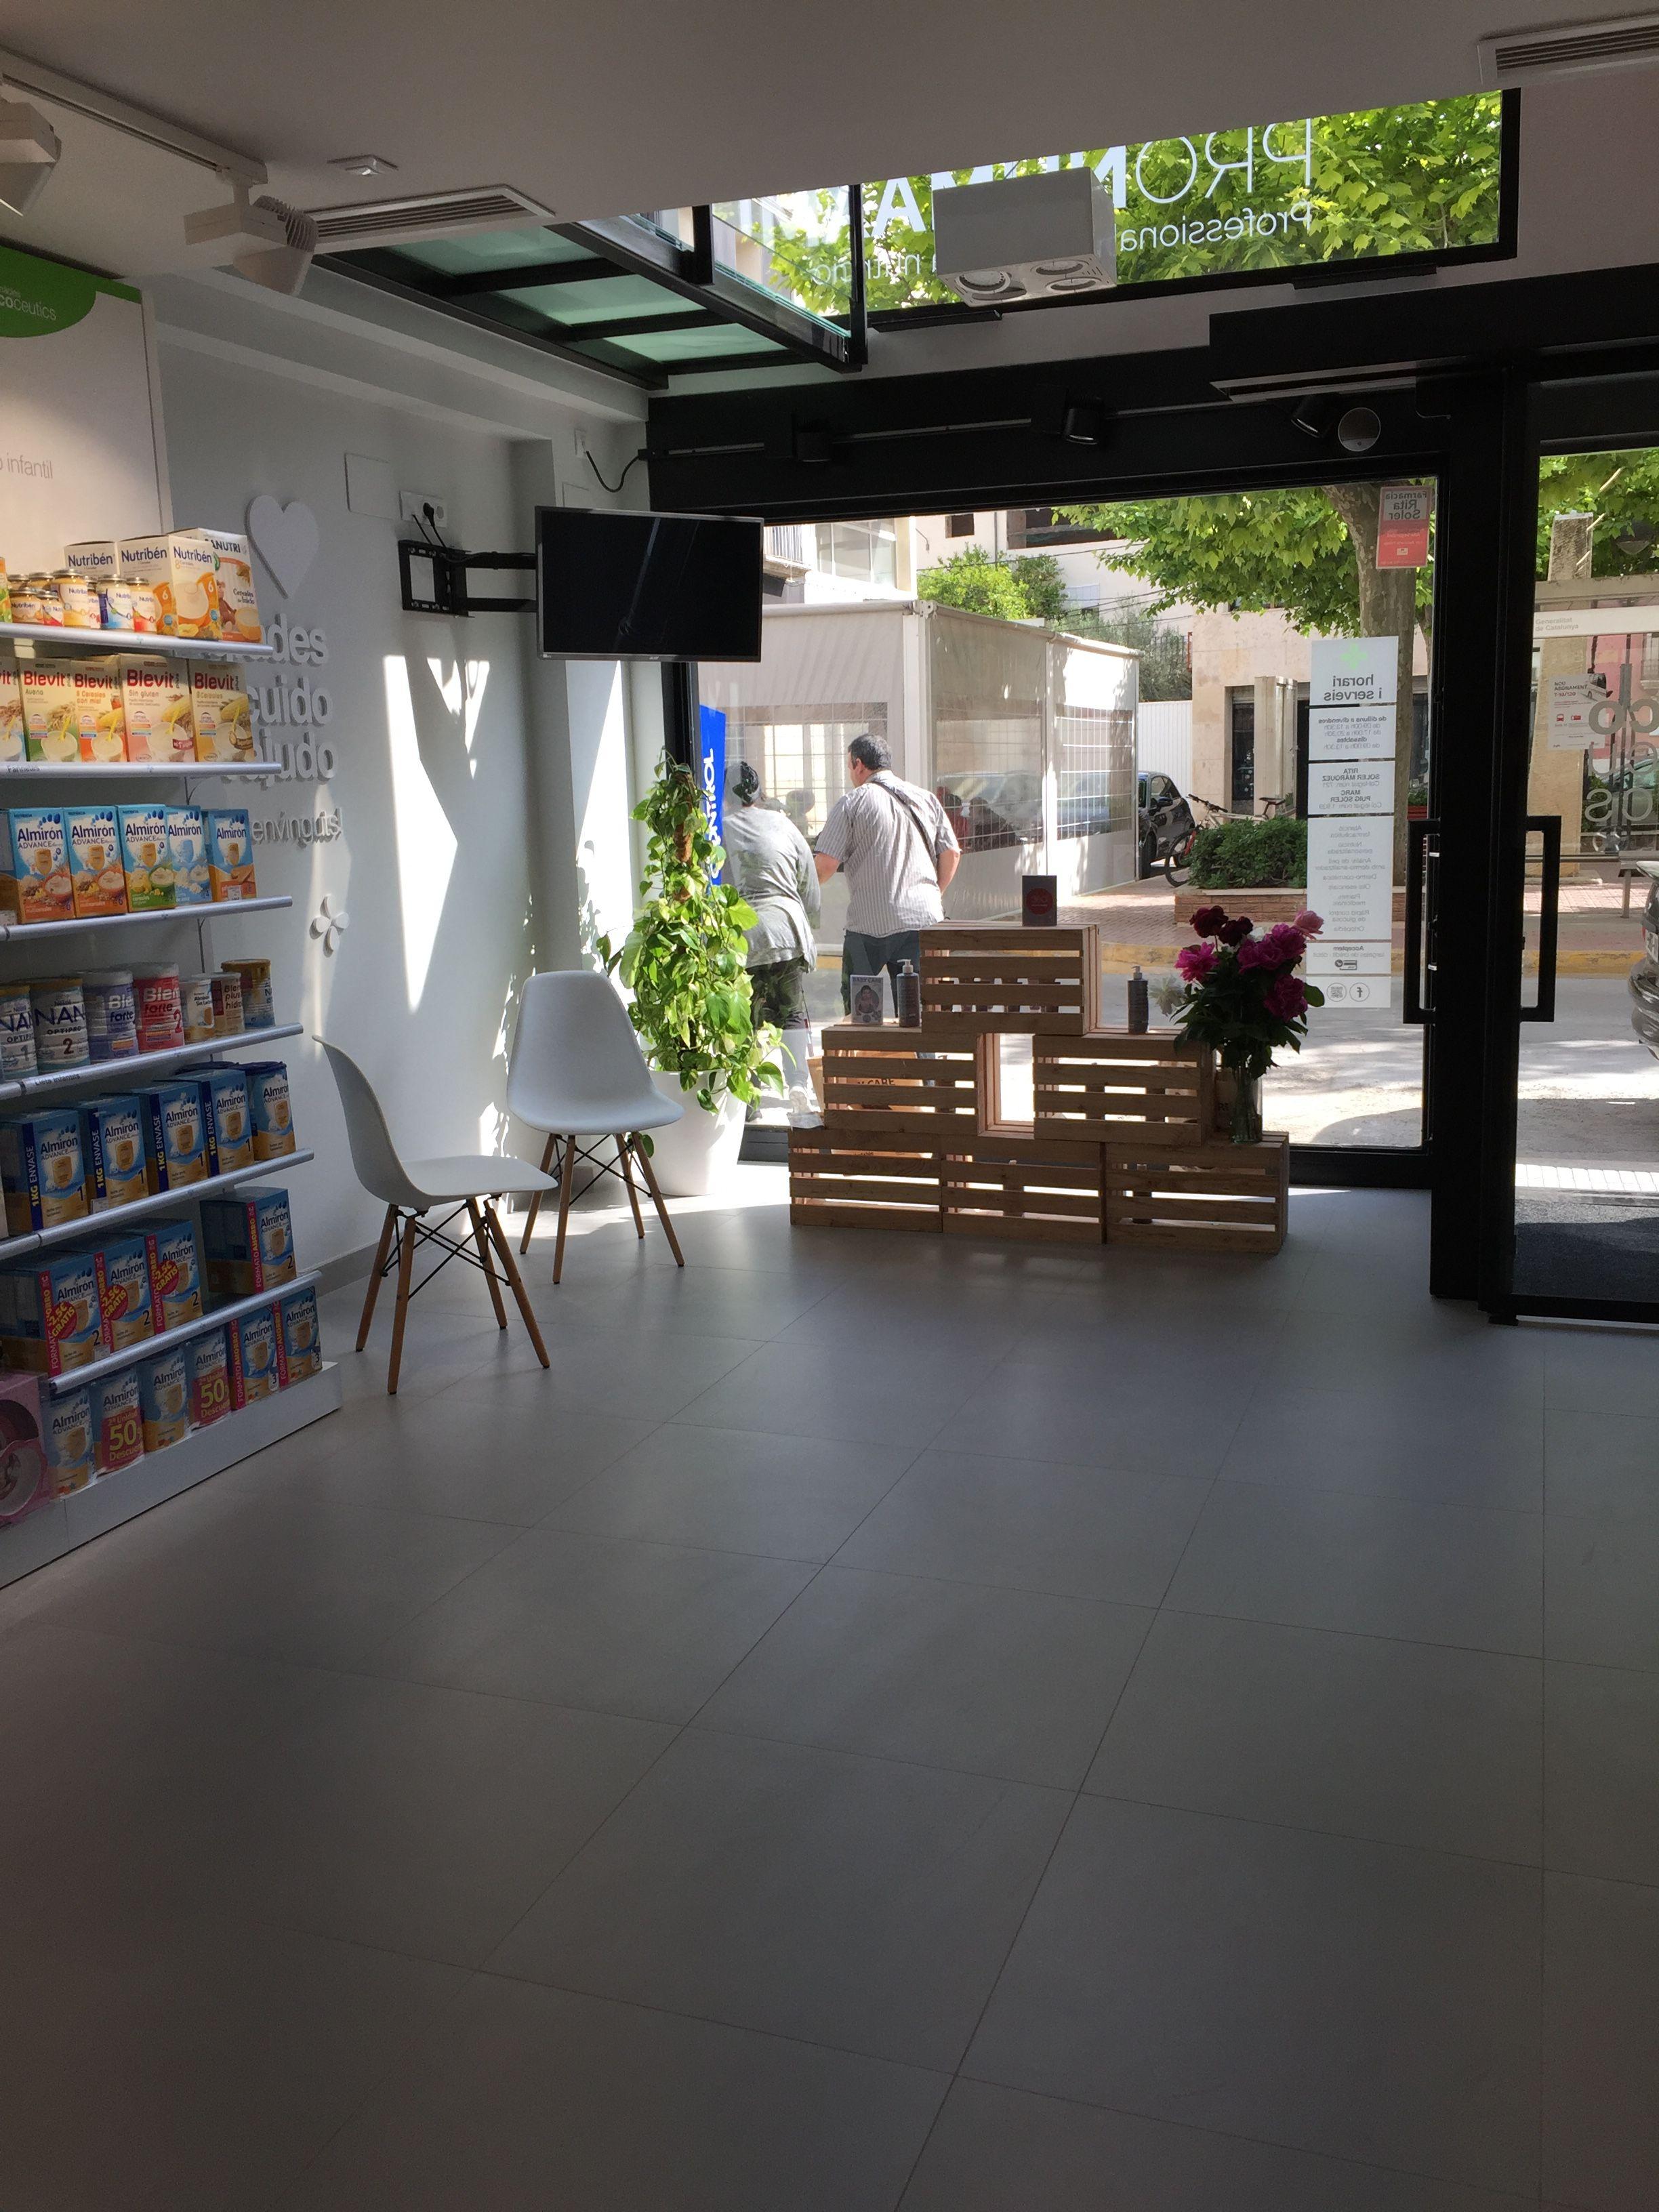 Farm Cia Rita Soler Ecoceutics Farmacias Pharmacy Ulldecona  # Muebles Ulldecona